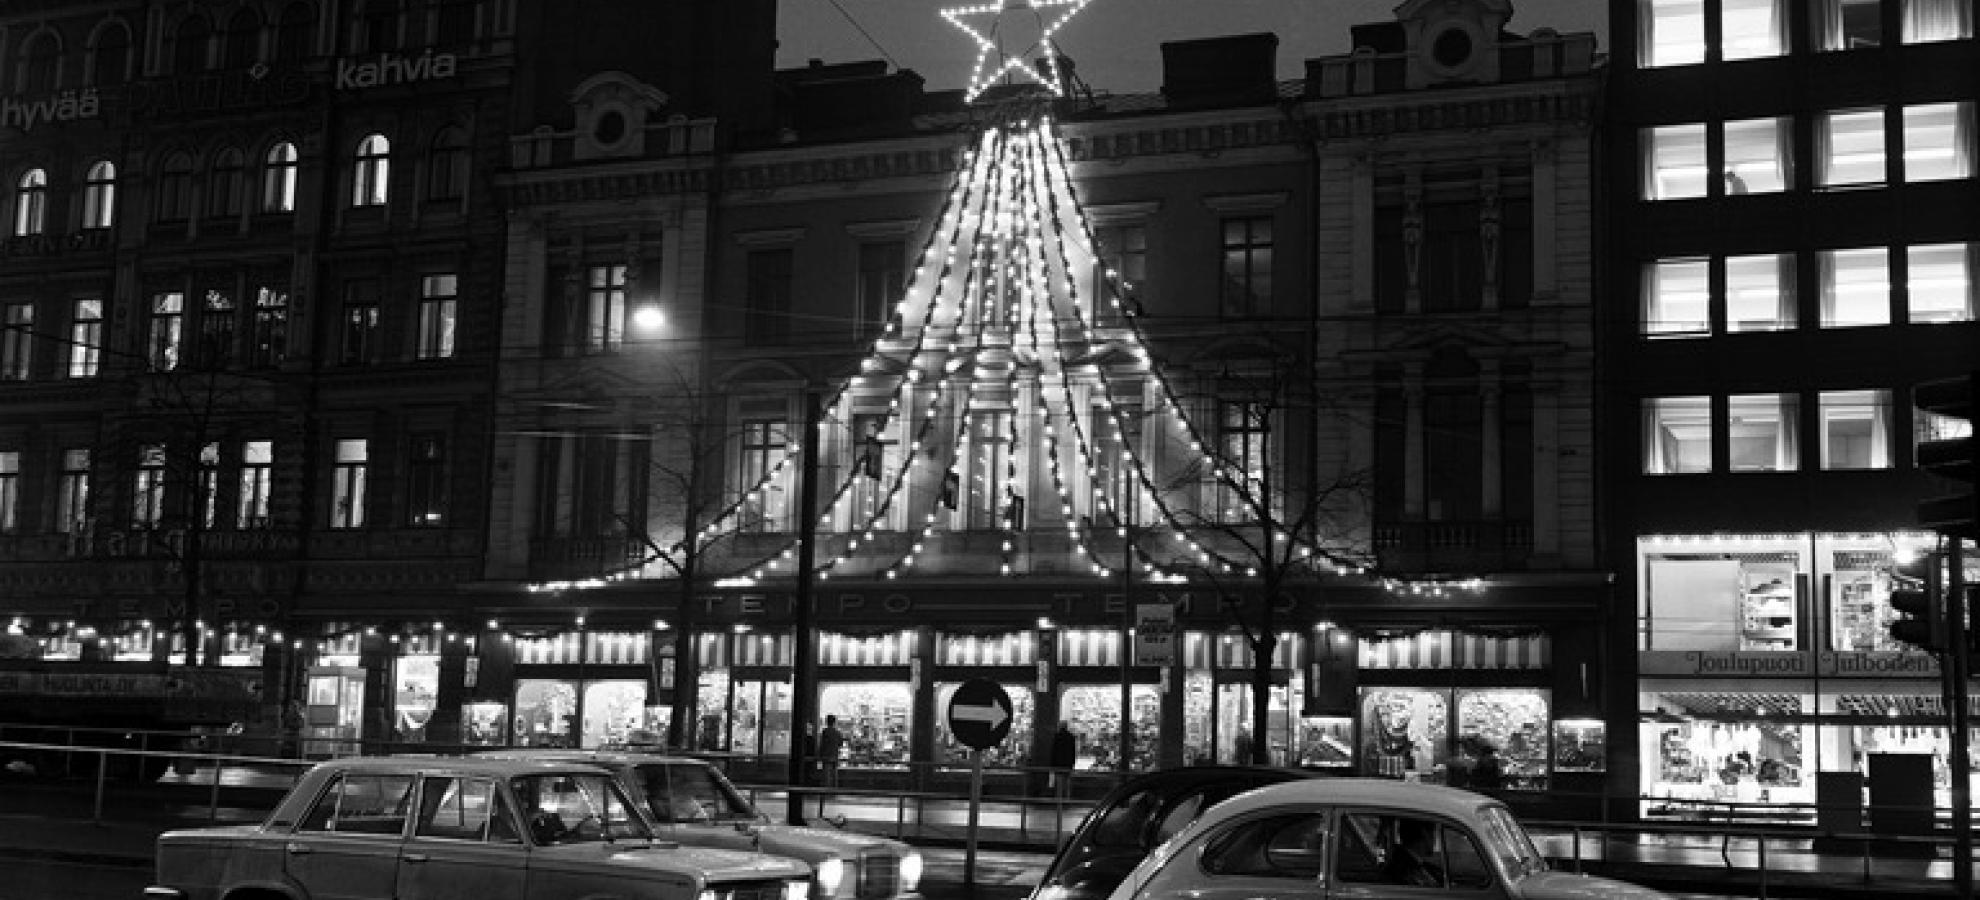 hursti joulu 2018 Helsinki's Christmas traditions | My Helsinki hursti joulu 2018